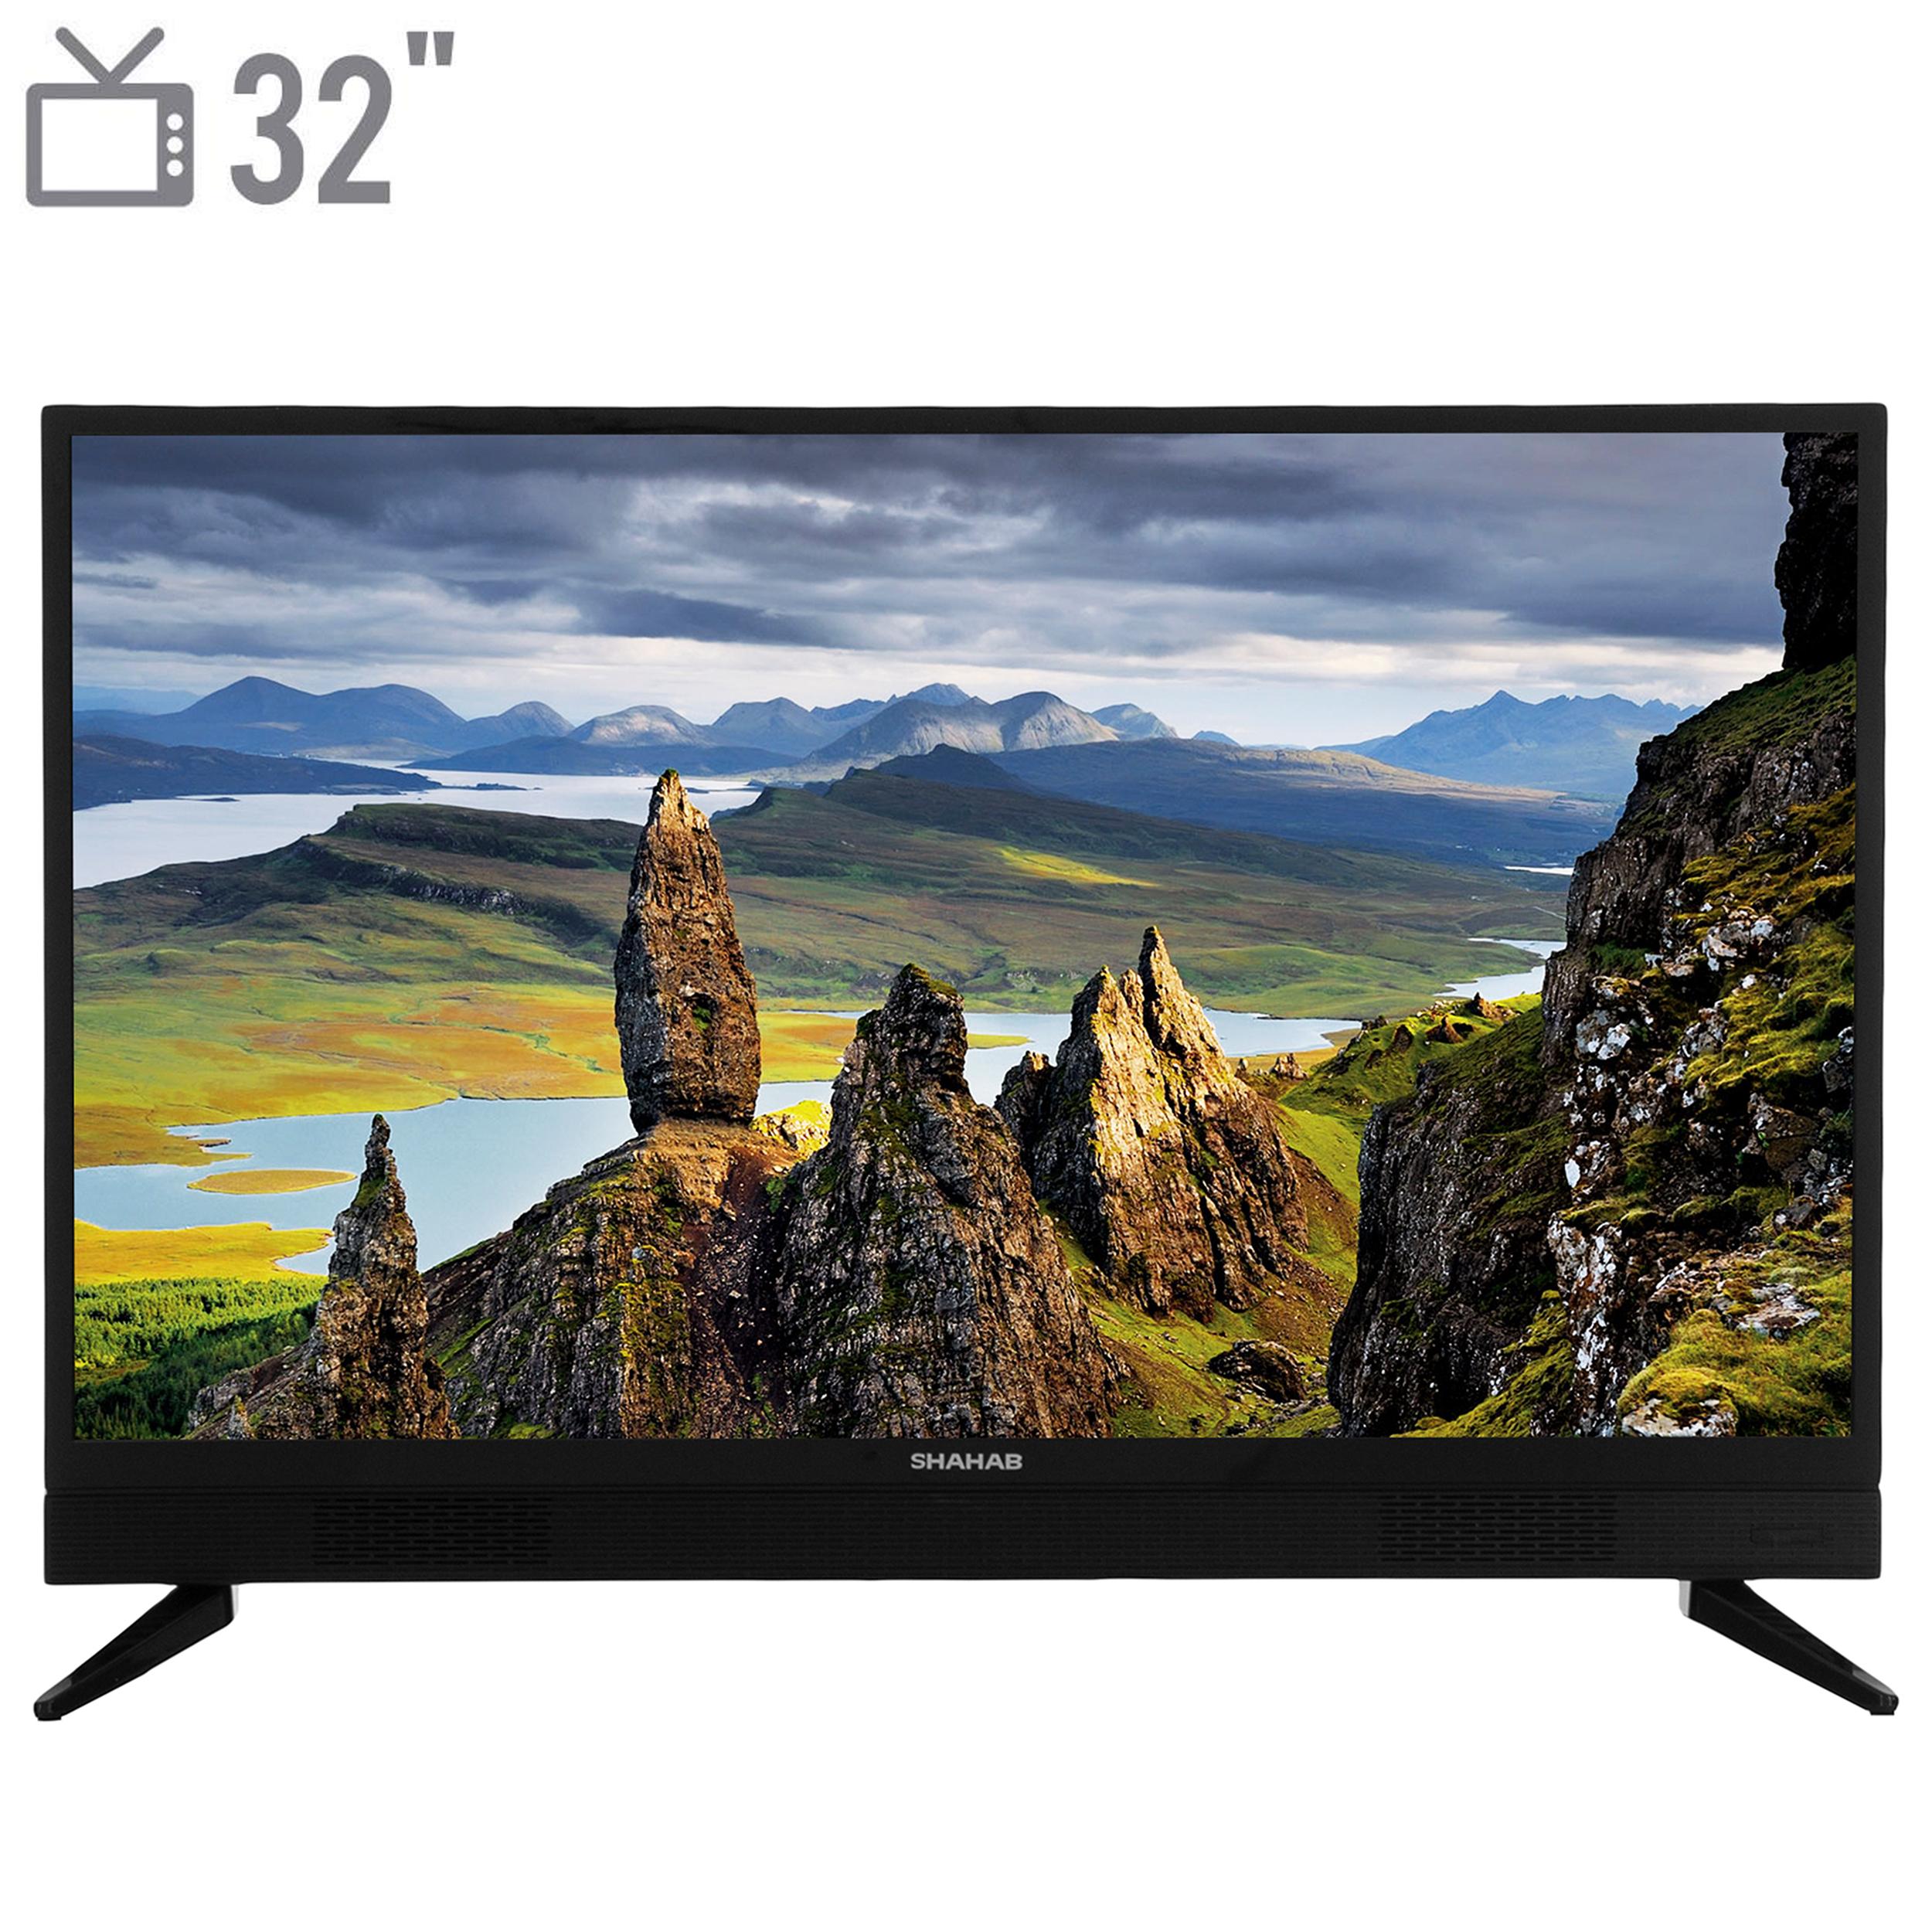 تلویزیون ال ای دی شهاب مدل  LED32SH202N1 سایز 32 اینچ